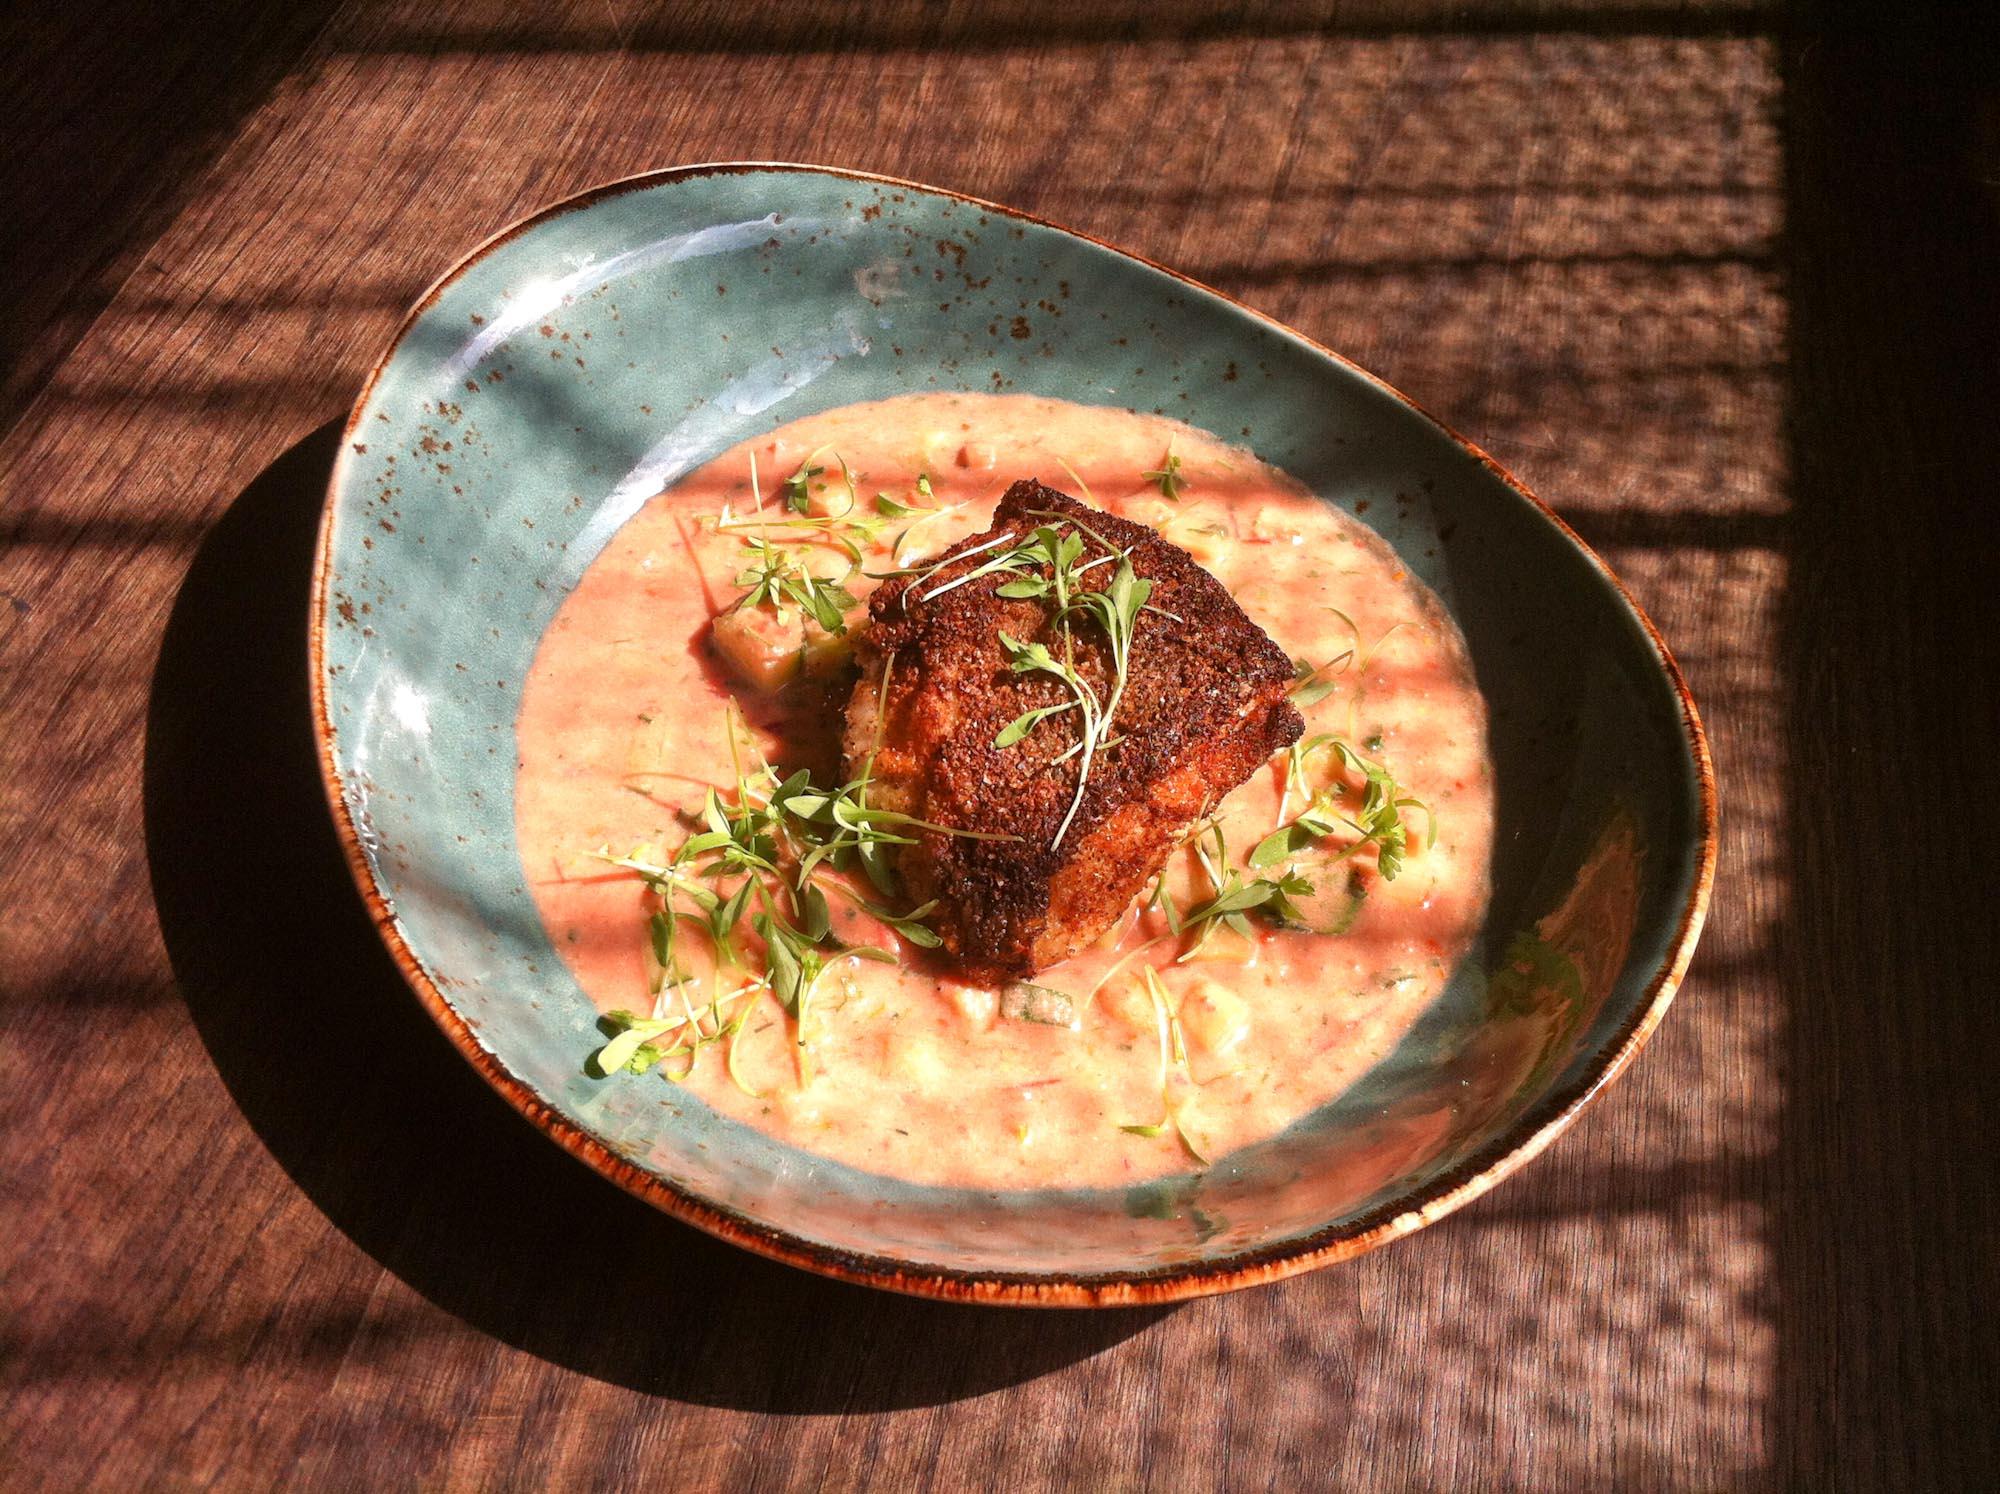 Coriander Cumin-Crusted Tilefish with peanut gazpacho. Chef JJ Johnson's dish for Battman's next book: Crossing Borders